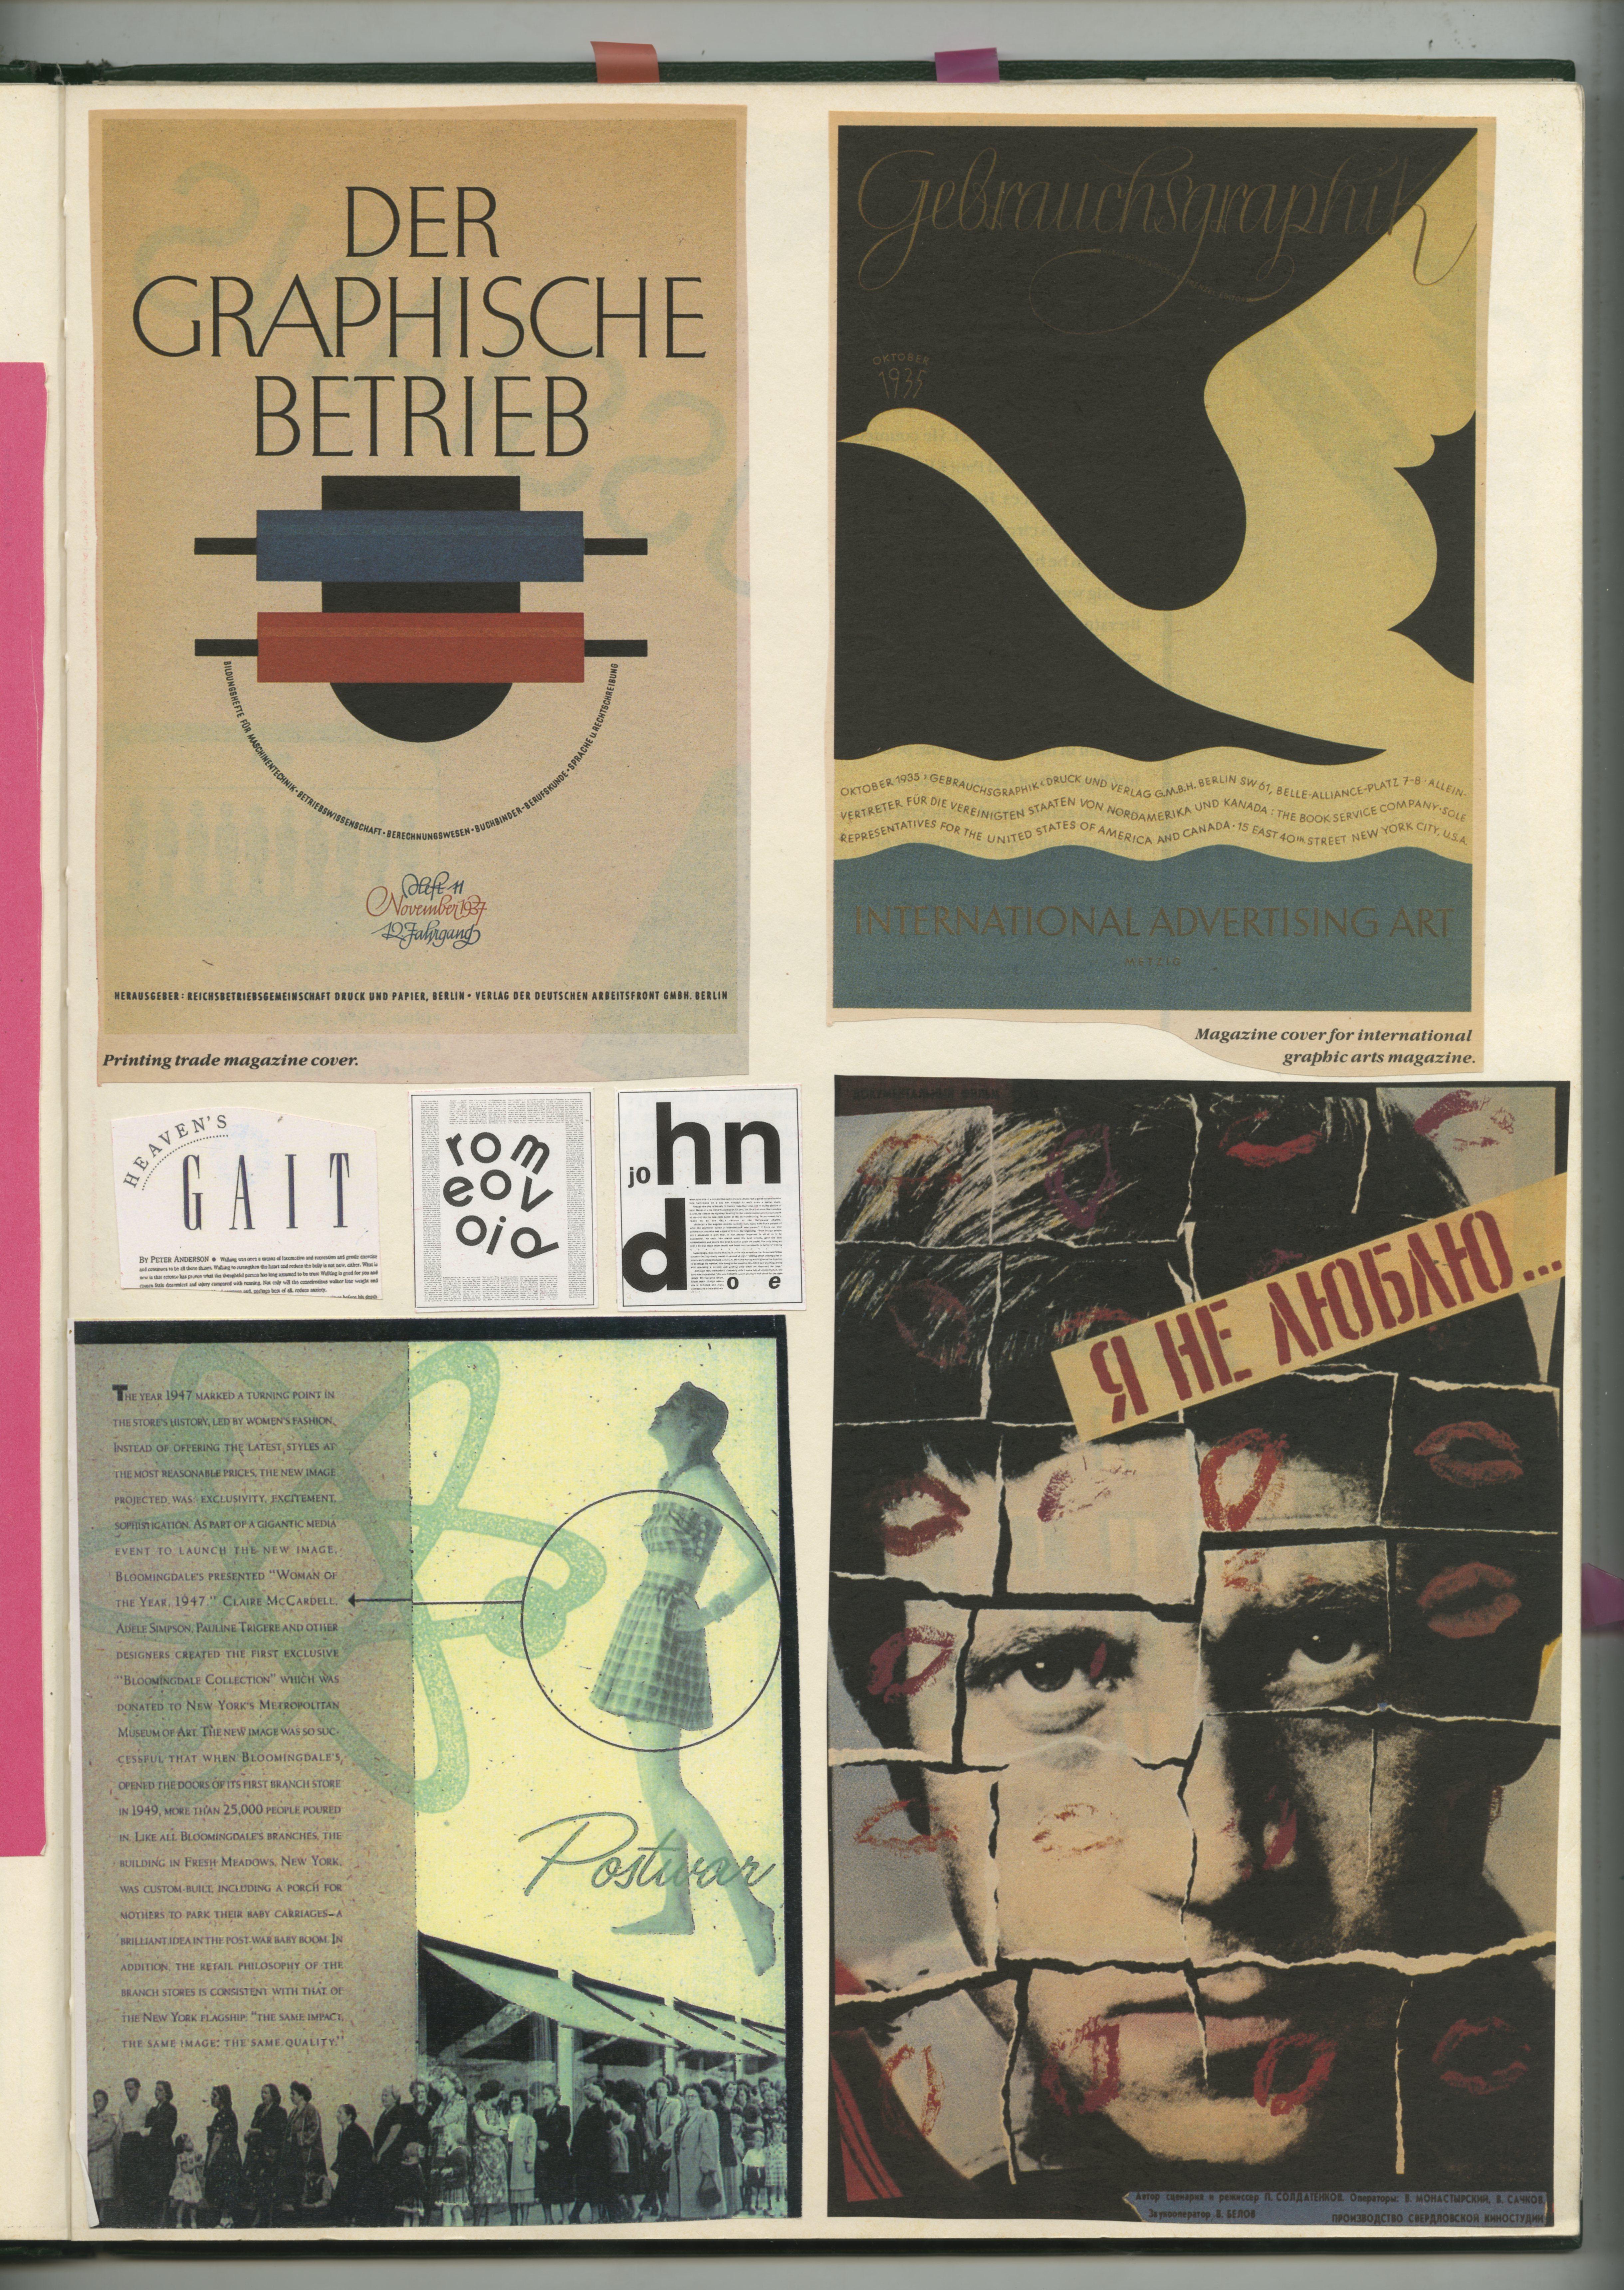 33. GREEN BOOKS: 'Type'